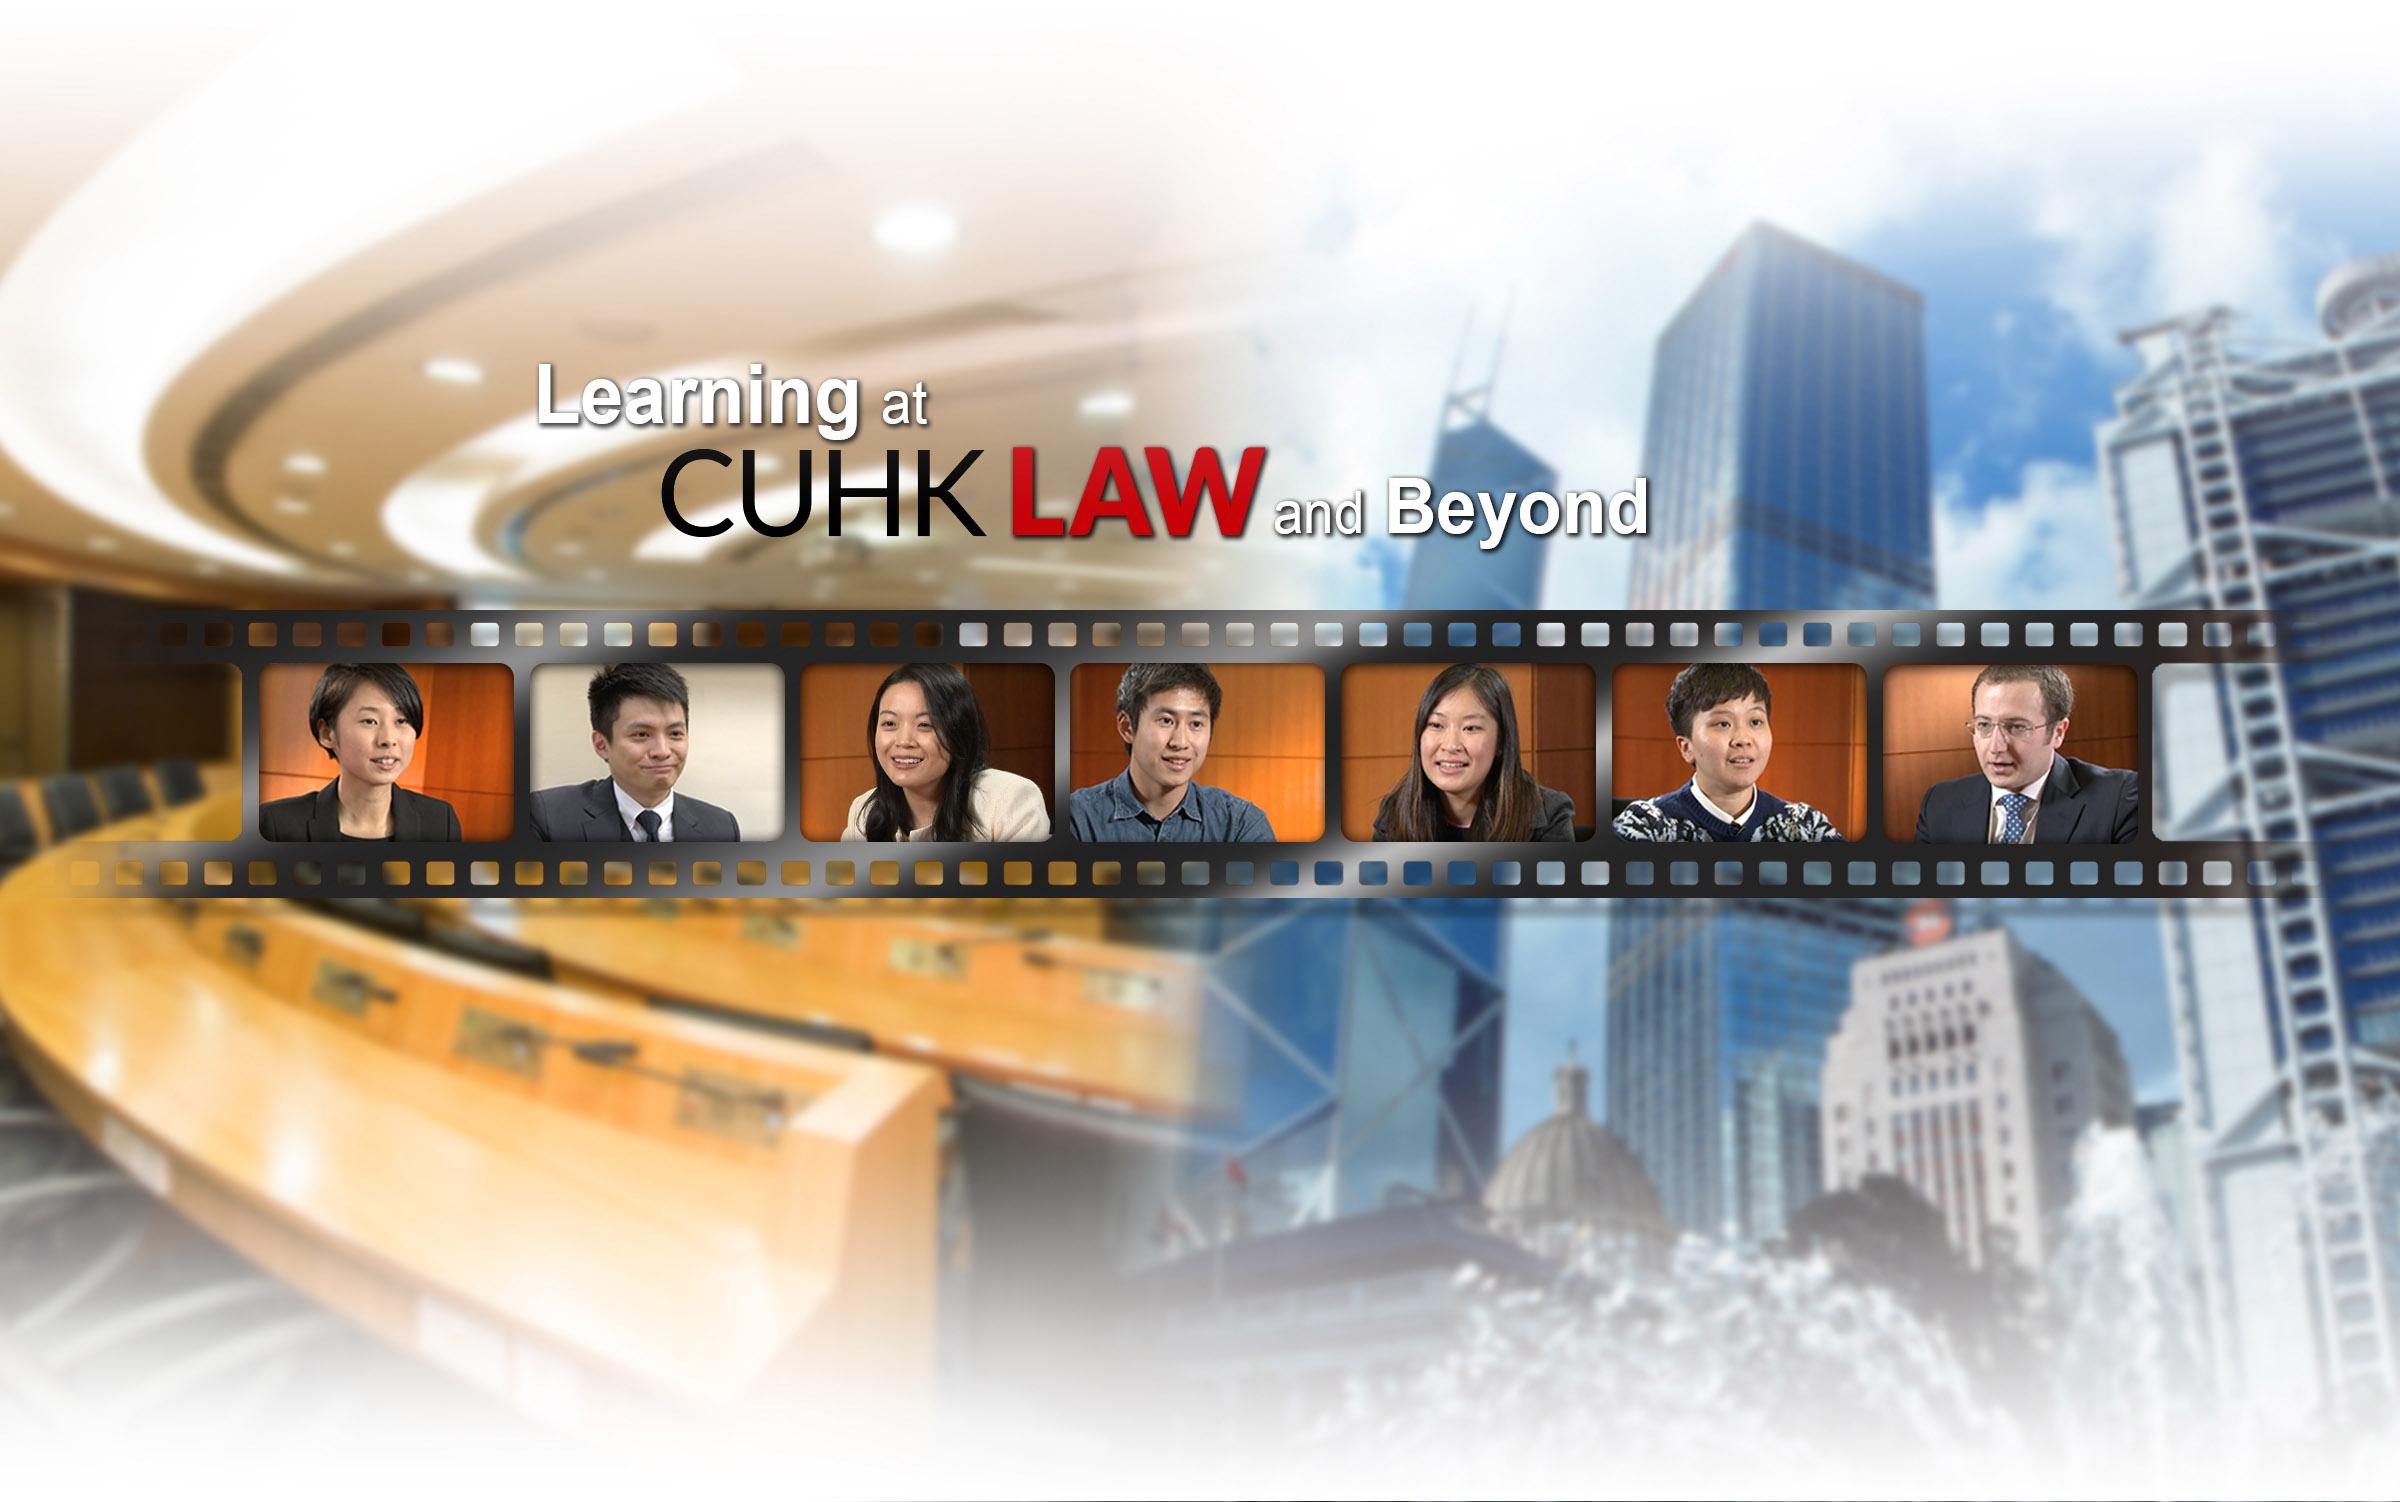 hong kong property law Ip factsheet: hong kong under the basic law, for intellectual property purposes, hong kong remains as a separate jurisdiction from the rest of china.